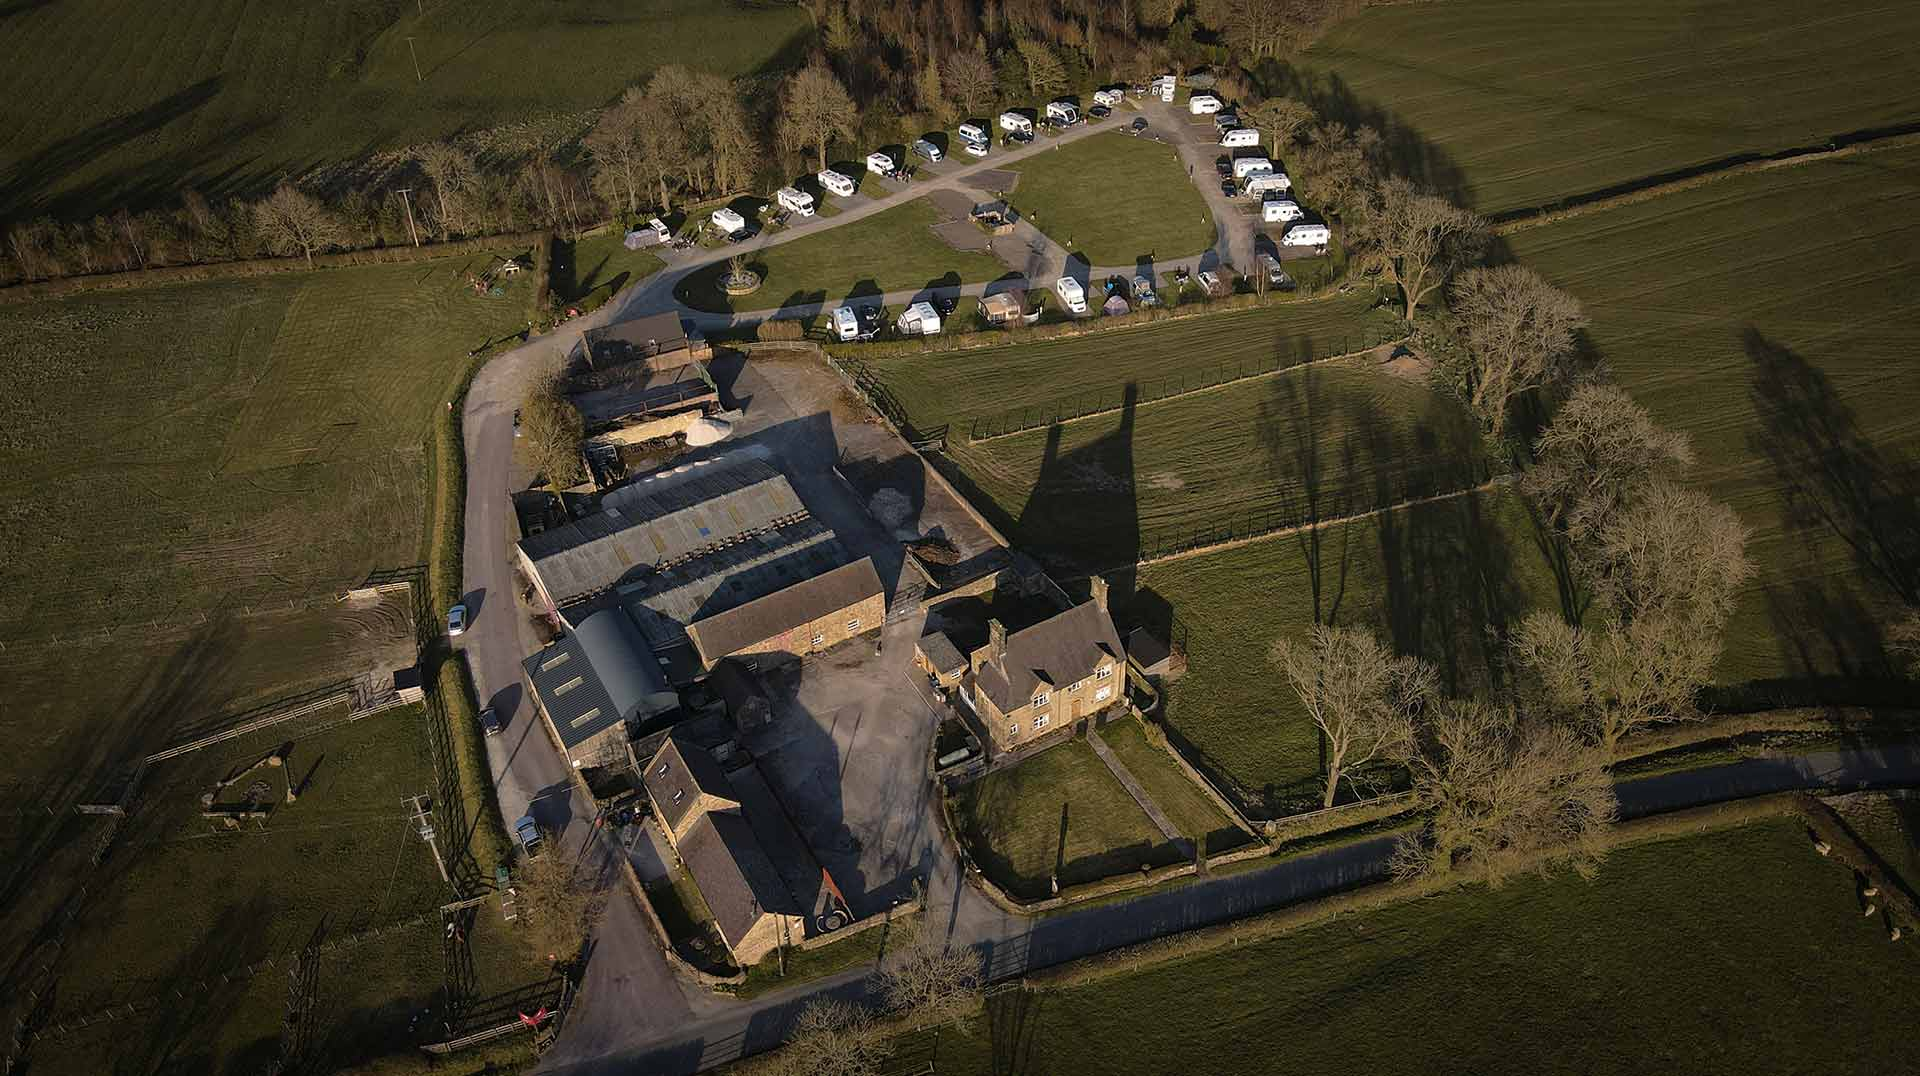 Upper Hurst Farm Campsite Aerial photograph